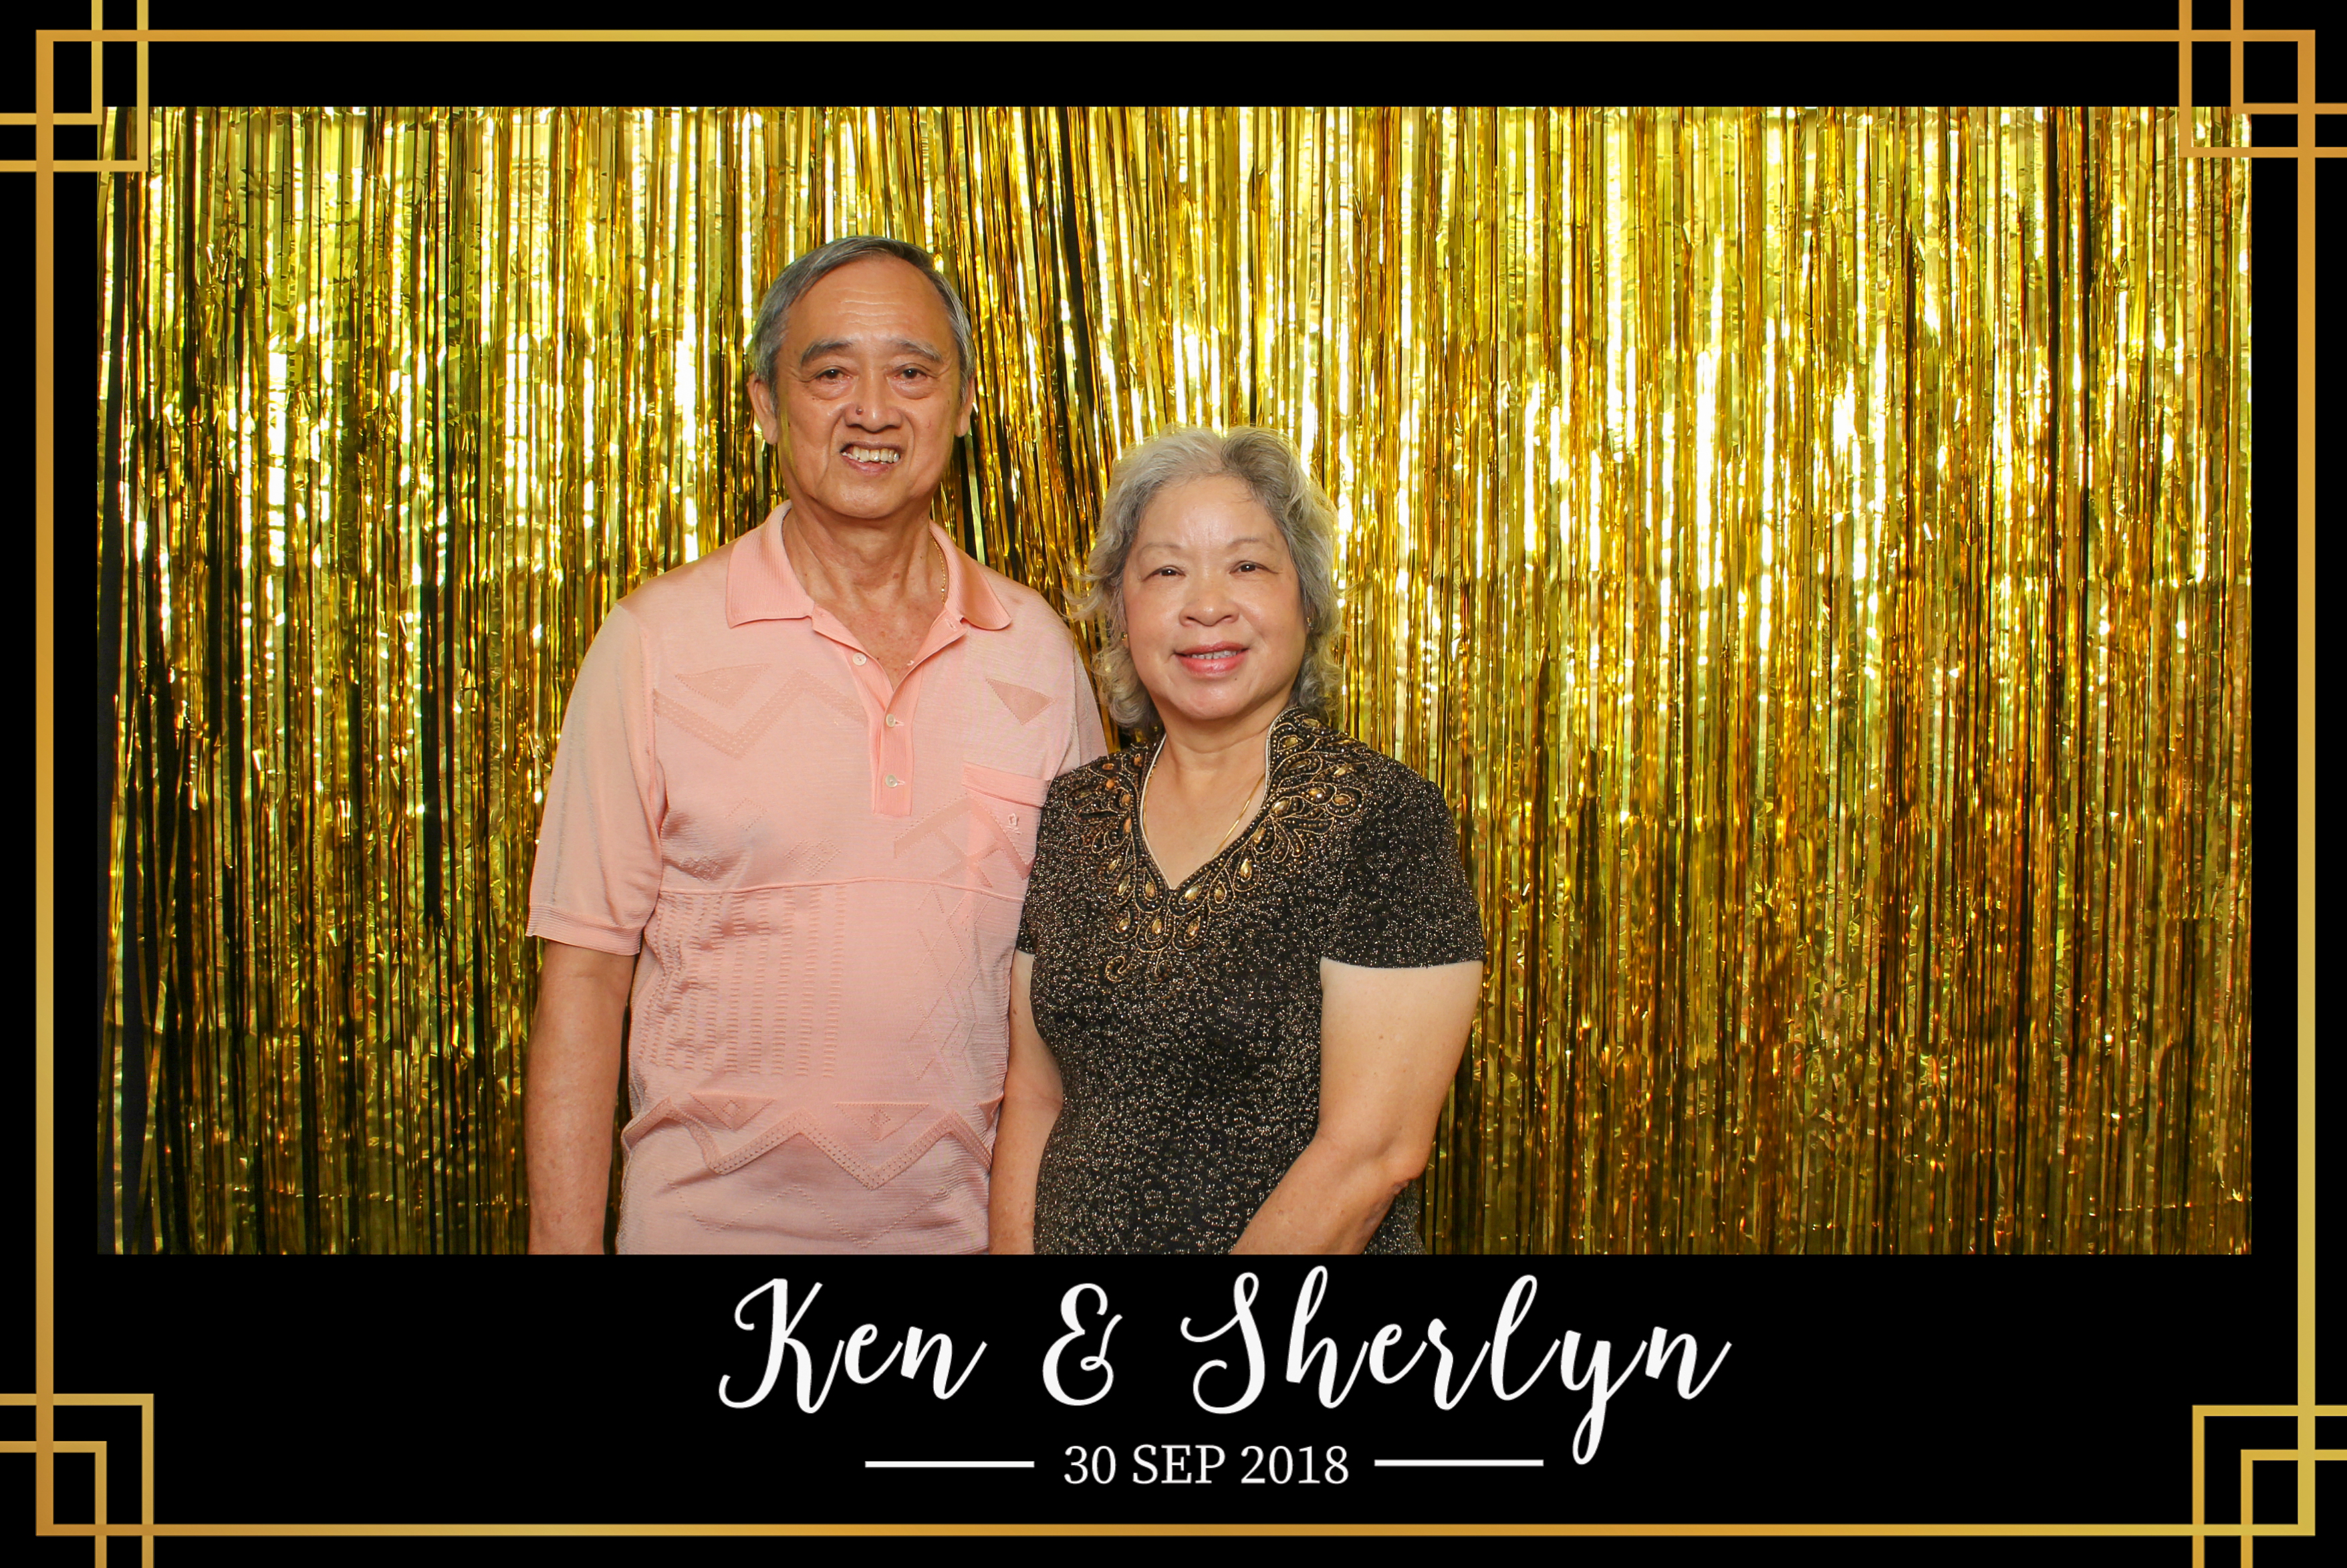 Ken Sherlyn wedding photo booth (24)